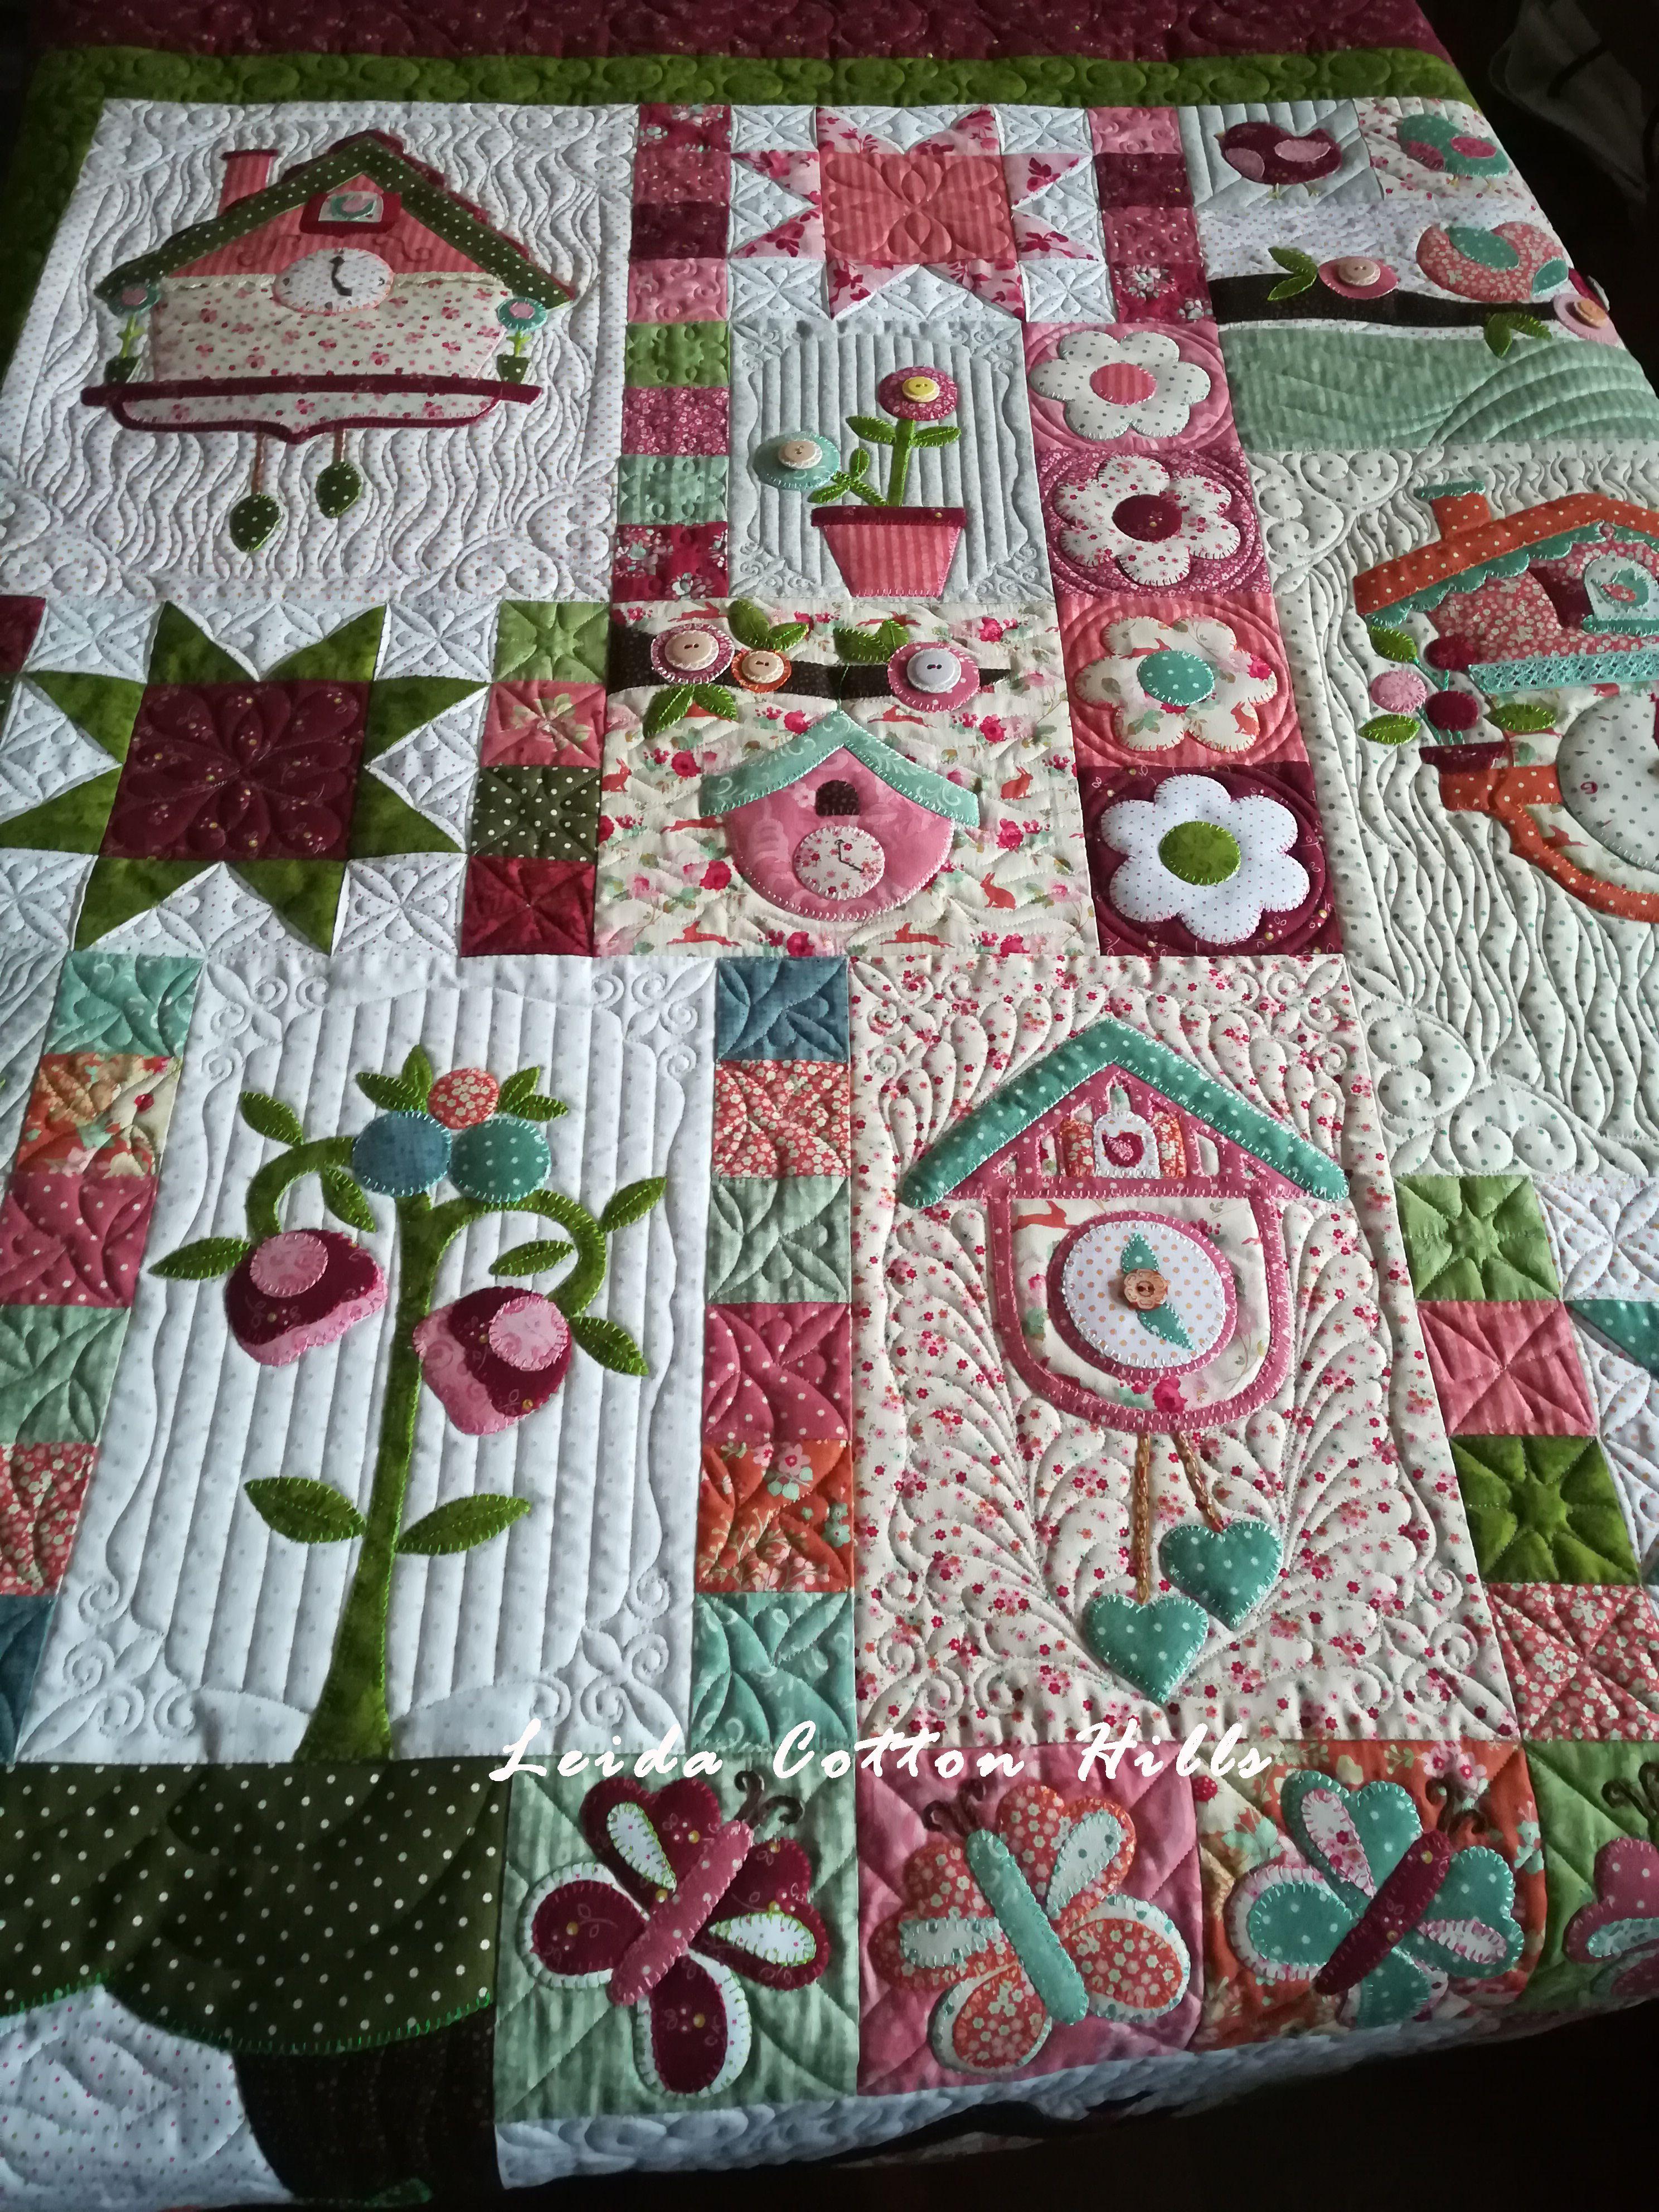 Leida Cotton Hills. Acolchados de patchwork con máquina de brazo largo.